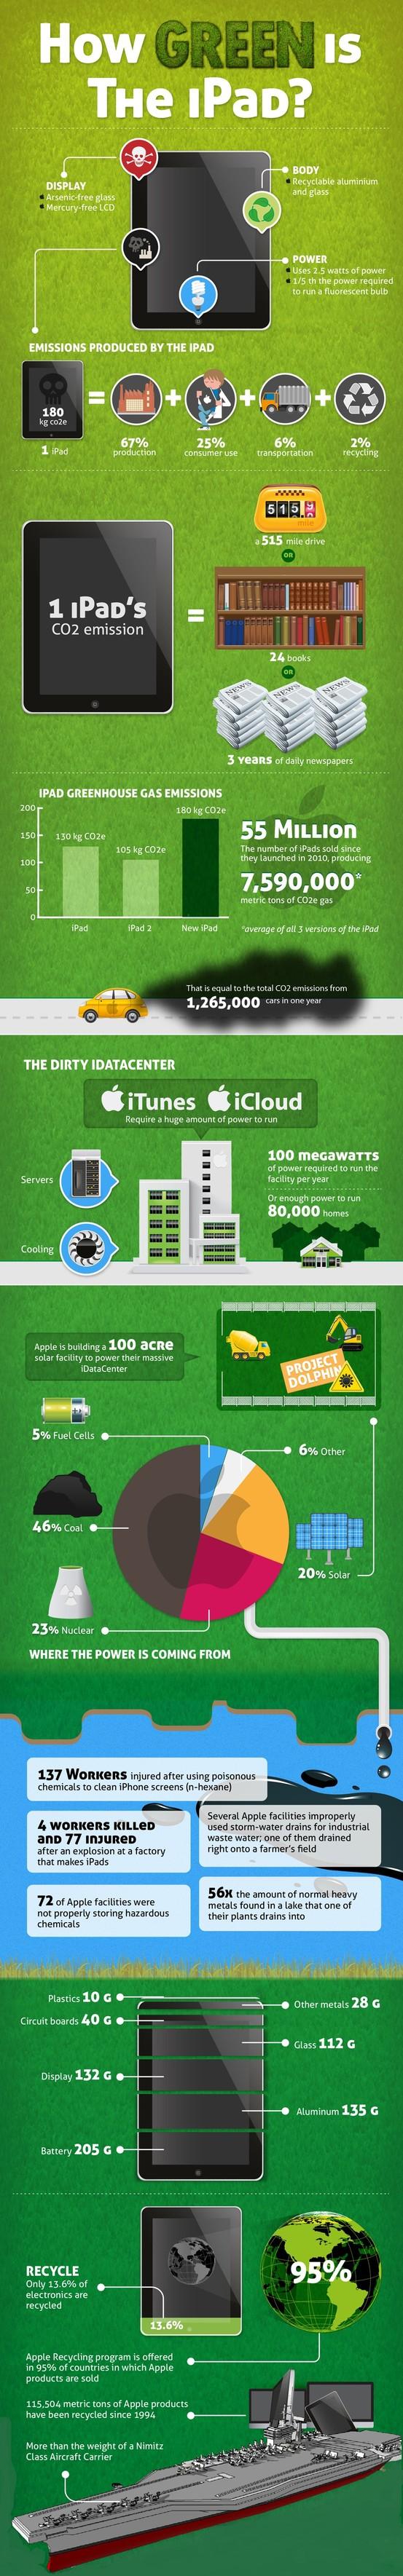 #Infographic #Infografia How green is your iPad?,¿Cómo de verde es tu iPad?...